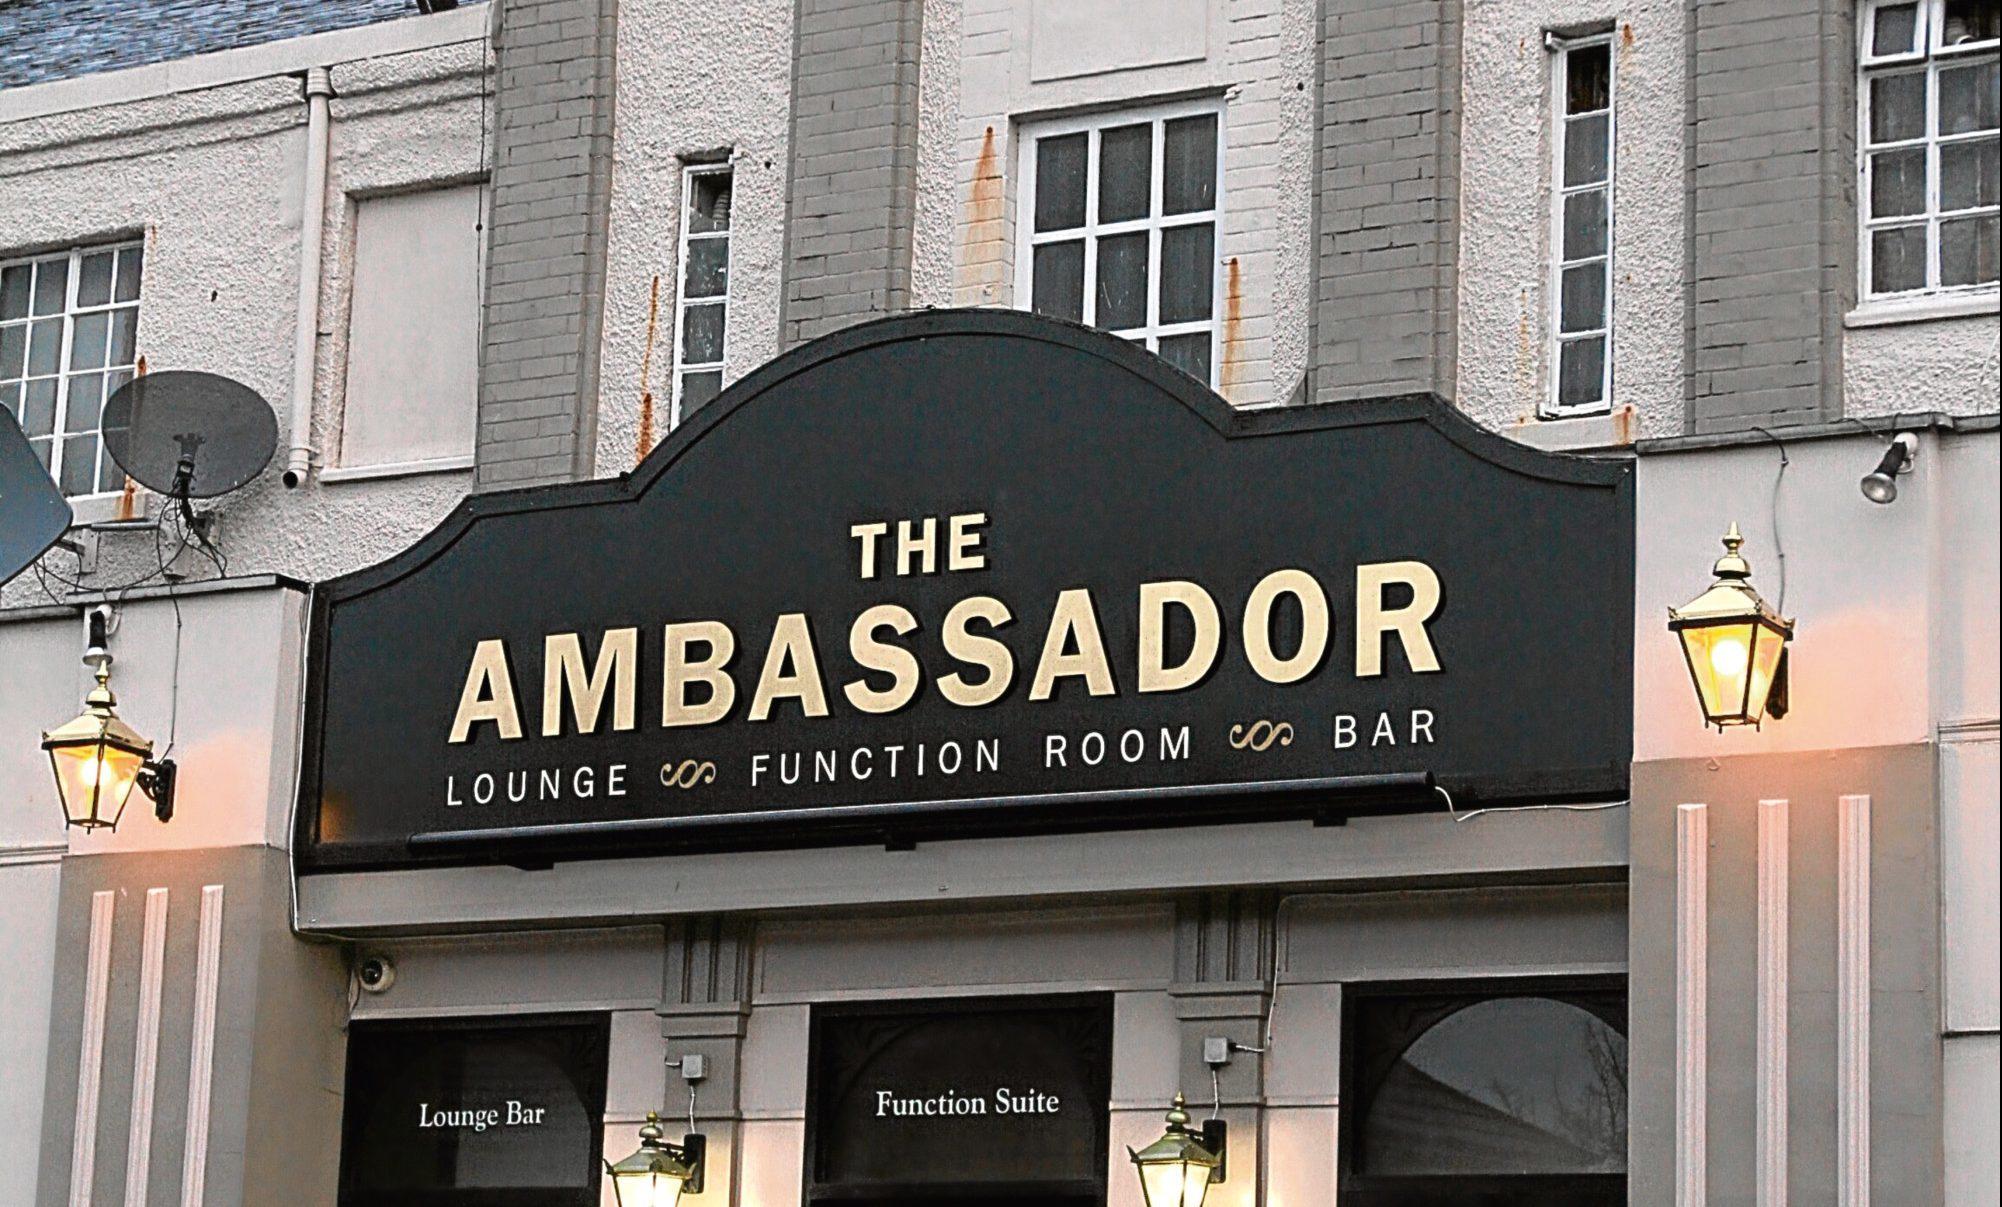 The Ambassador Bar on Clepington Road.